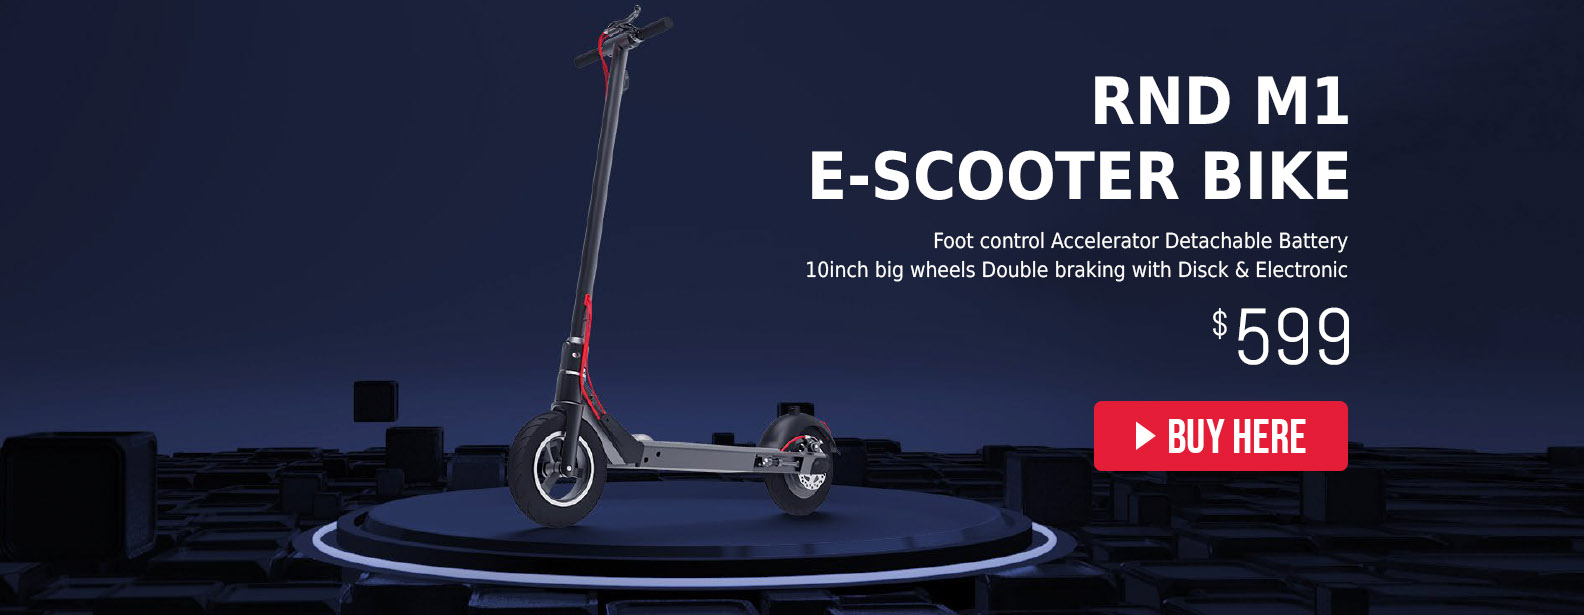 RND M1 E-Scooter Bike